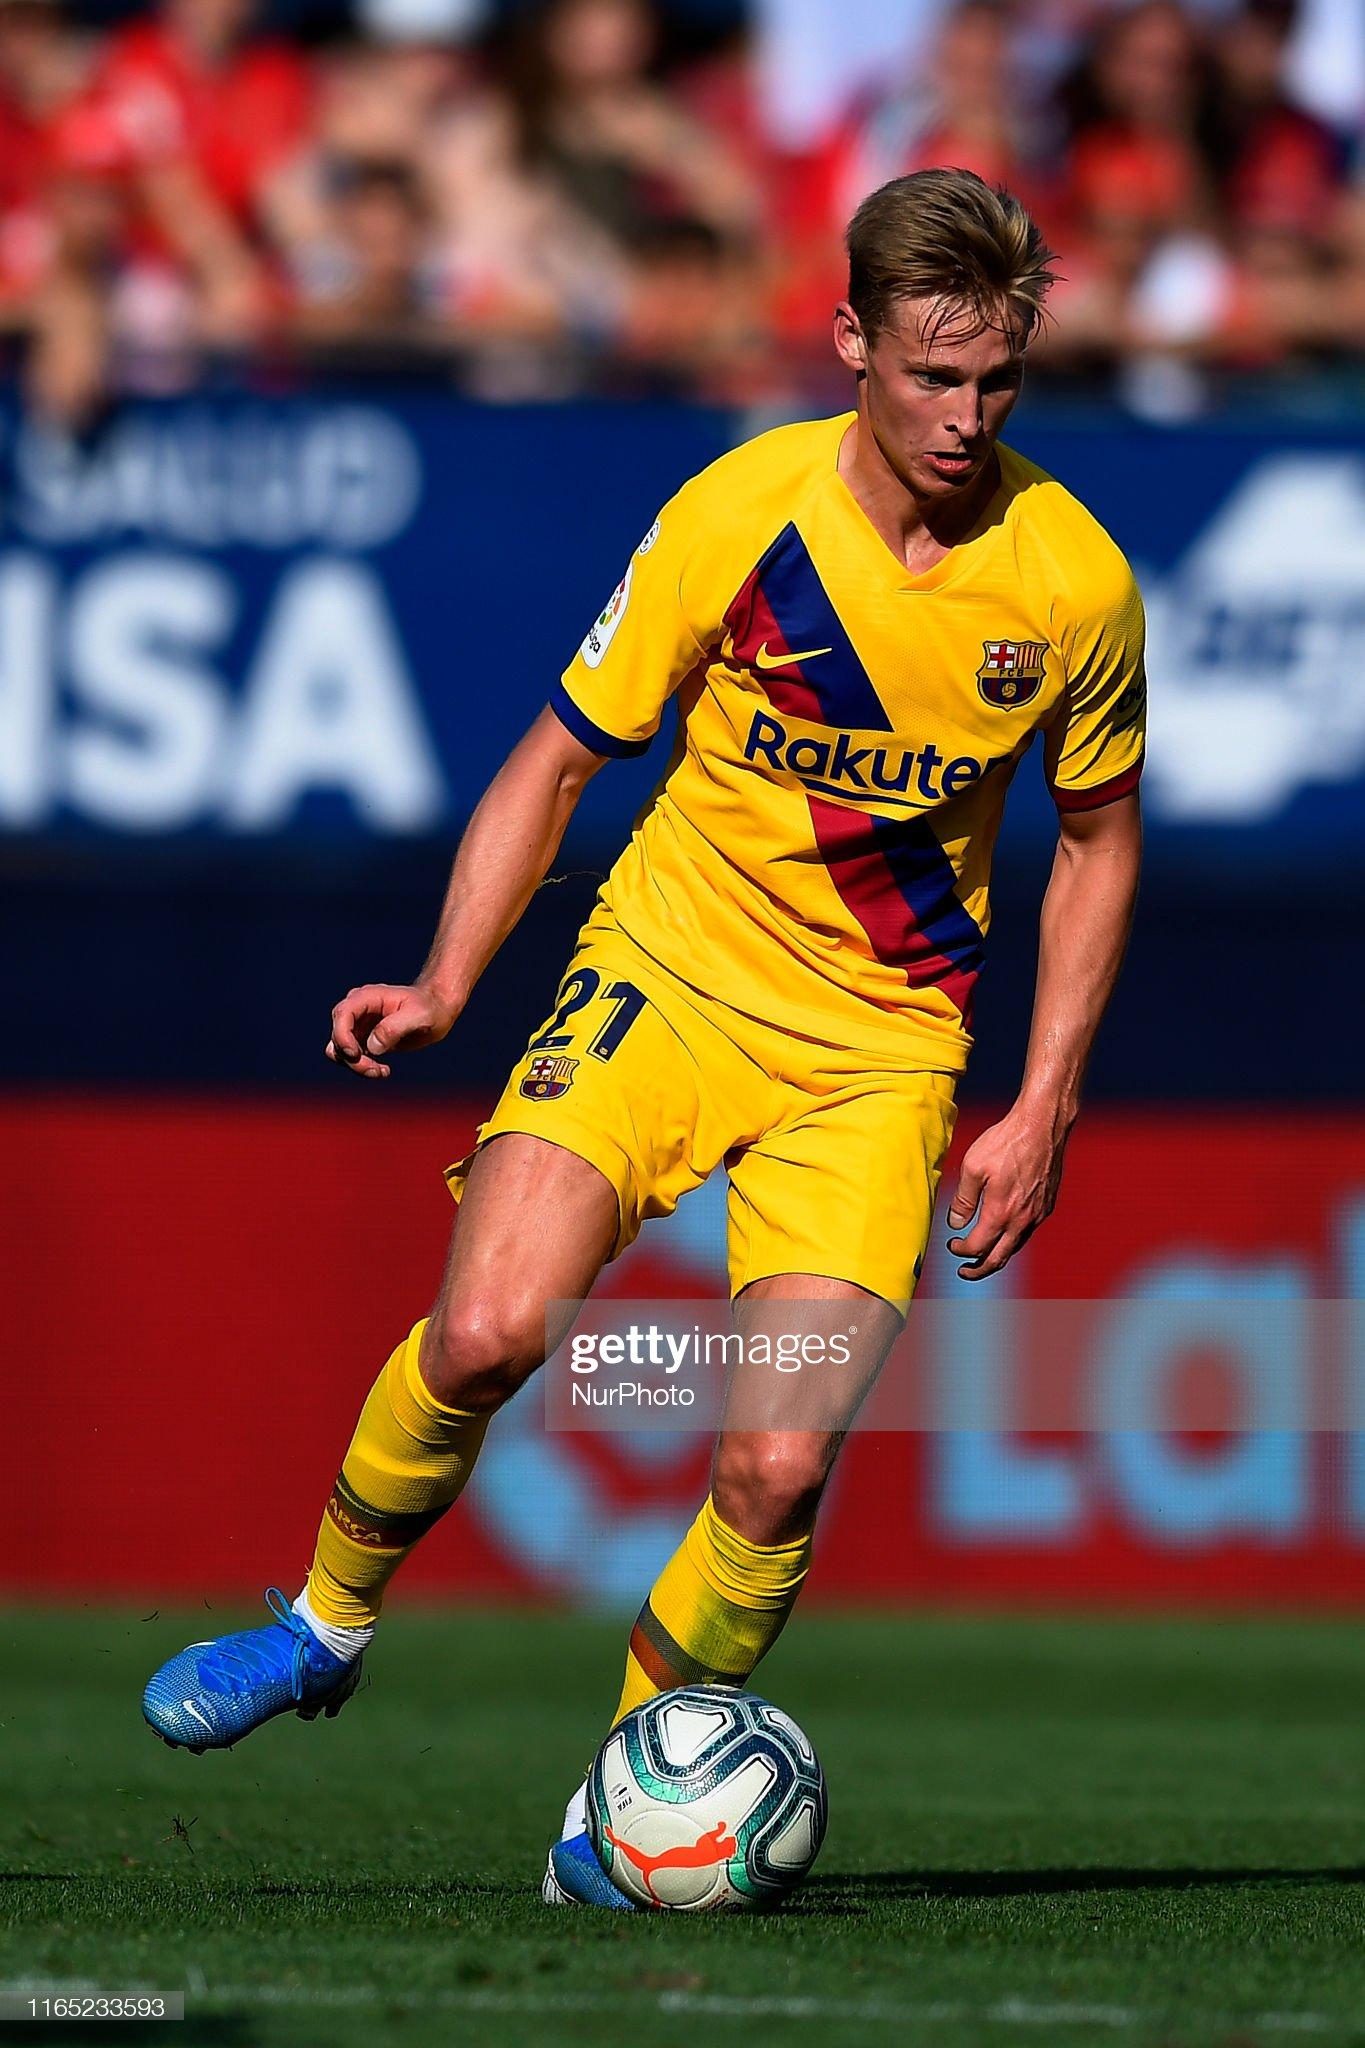 صور مباراة : أوساسونا - برشلونة 2-2 ( 31-08-2019 )  Frenkie-de-jong-of-barcelona-in-action-during-the-liga-match-between-picture-id1165233593?s=2048x2048